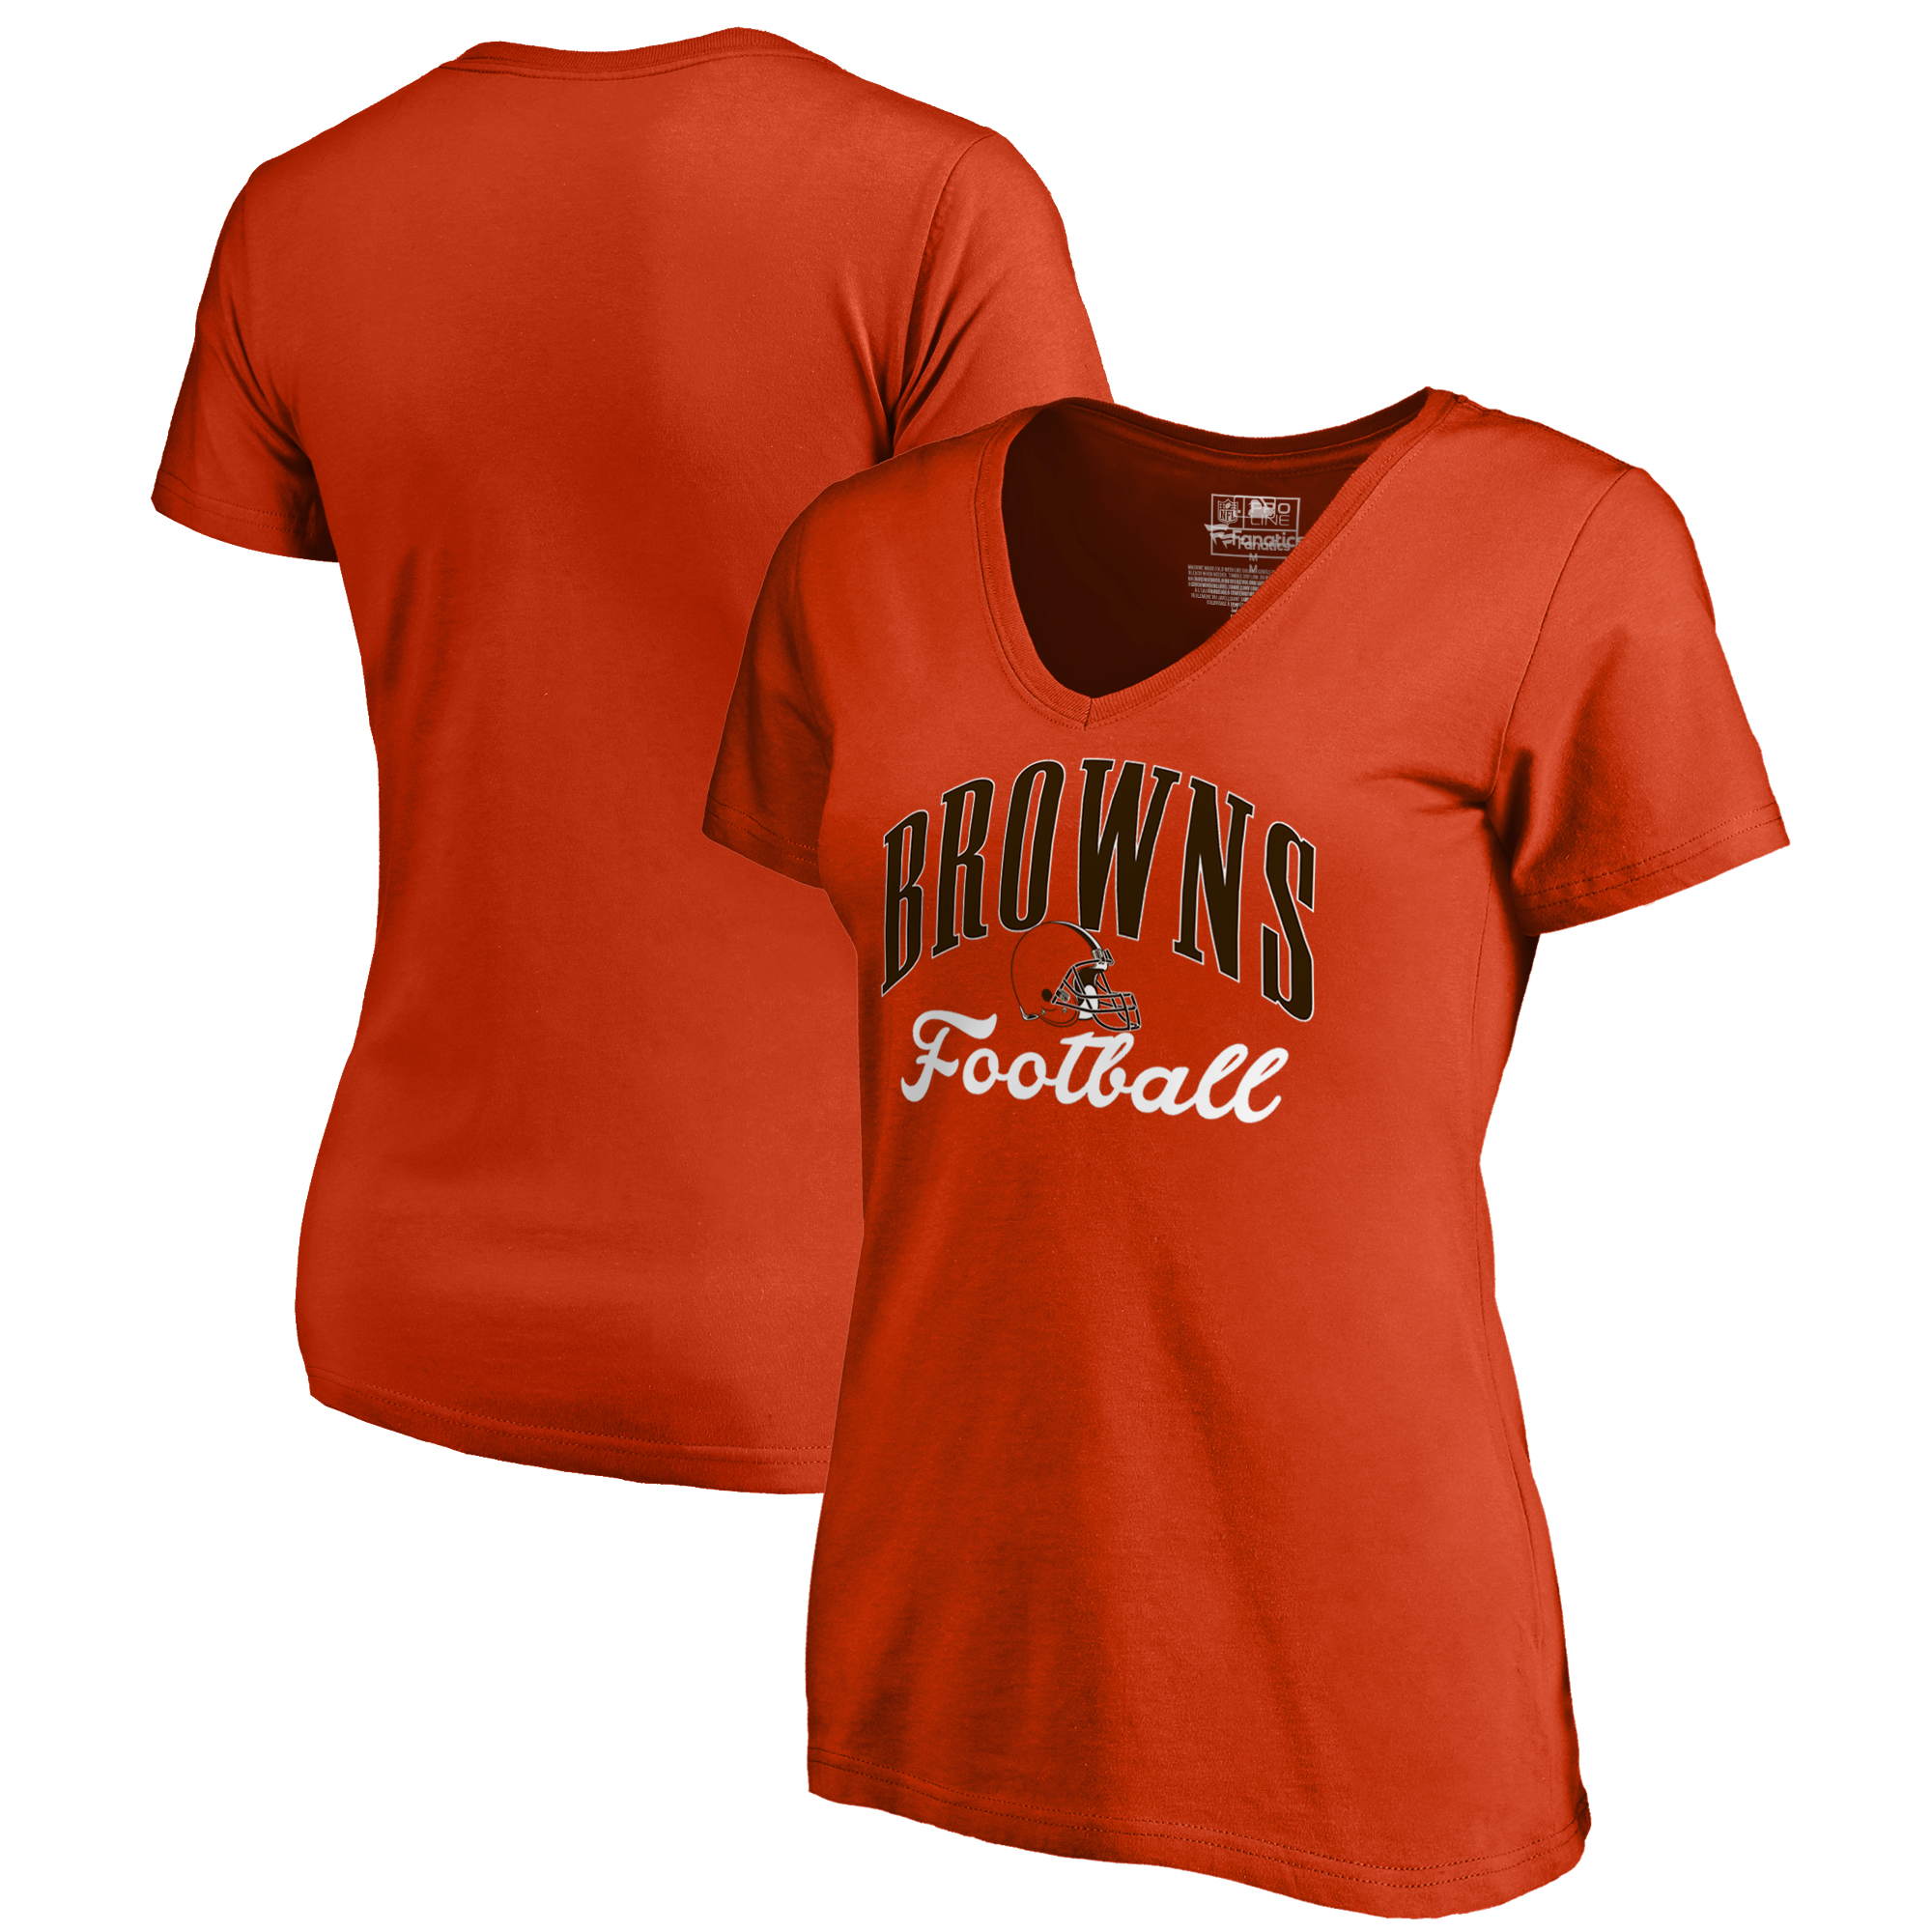 Cleveland Browns NFL Pro Line by Fanatics Branded Women's Victory Script V-Neck T-Shirt -Orange